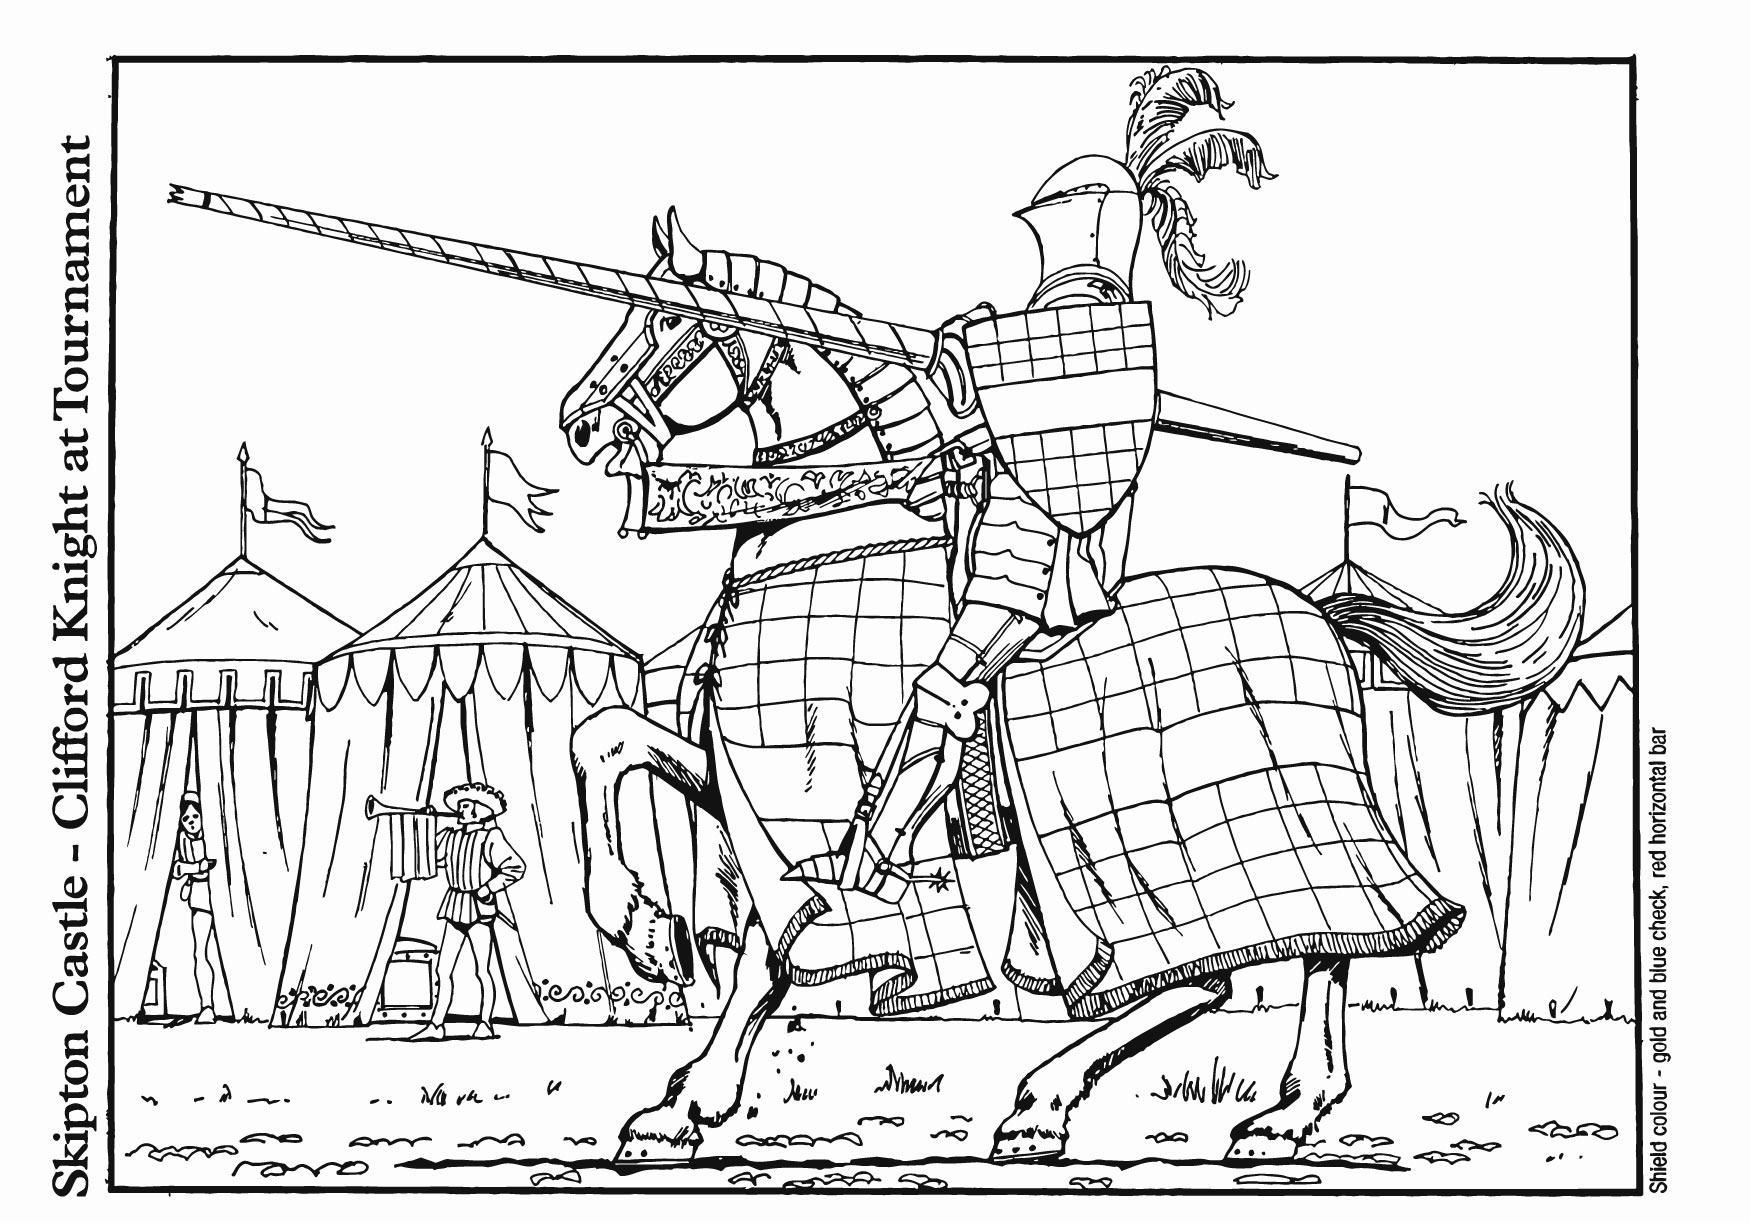 Kleurplaten Ridders Kastelen.Kleurplaat Ridder Op Toernooi Afb 14898